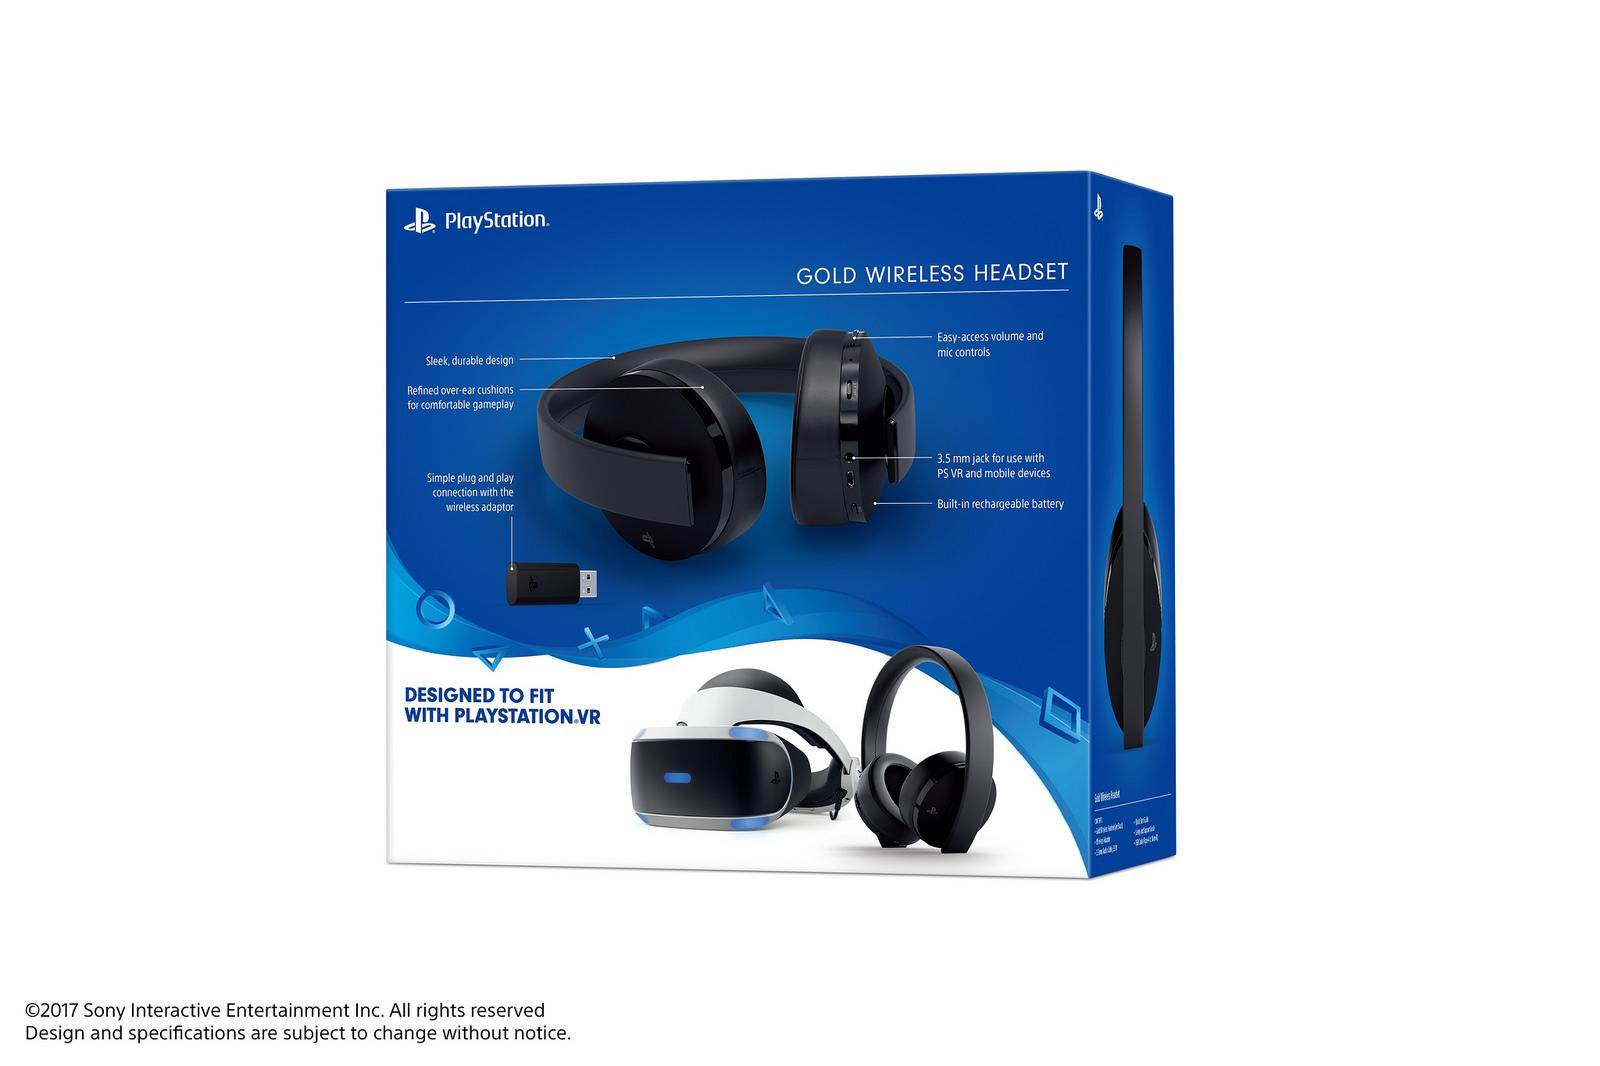 Sony revela novo modelo do headset Gold para PlayStation 4 e PS VR